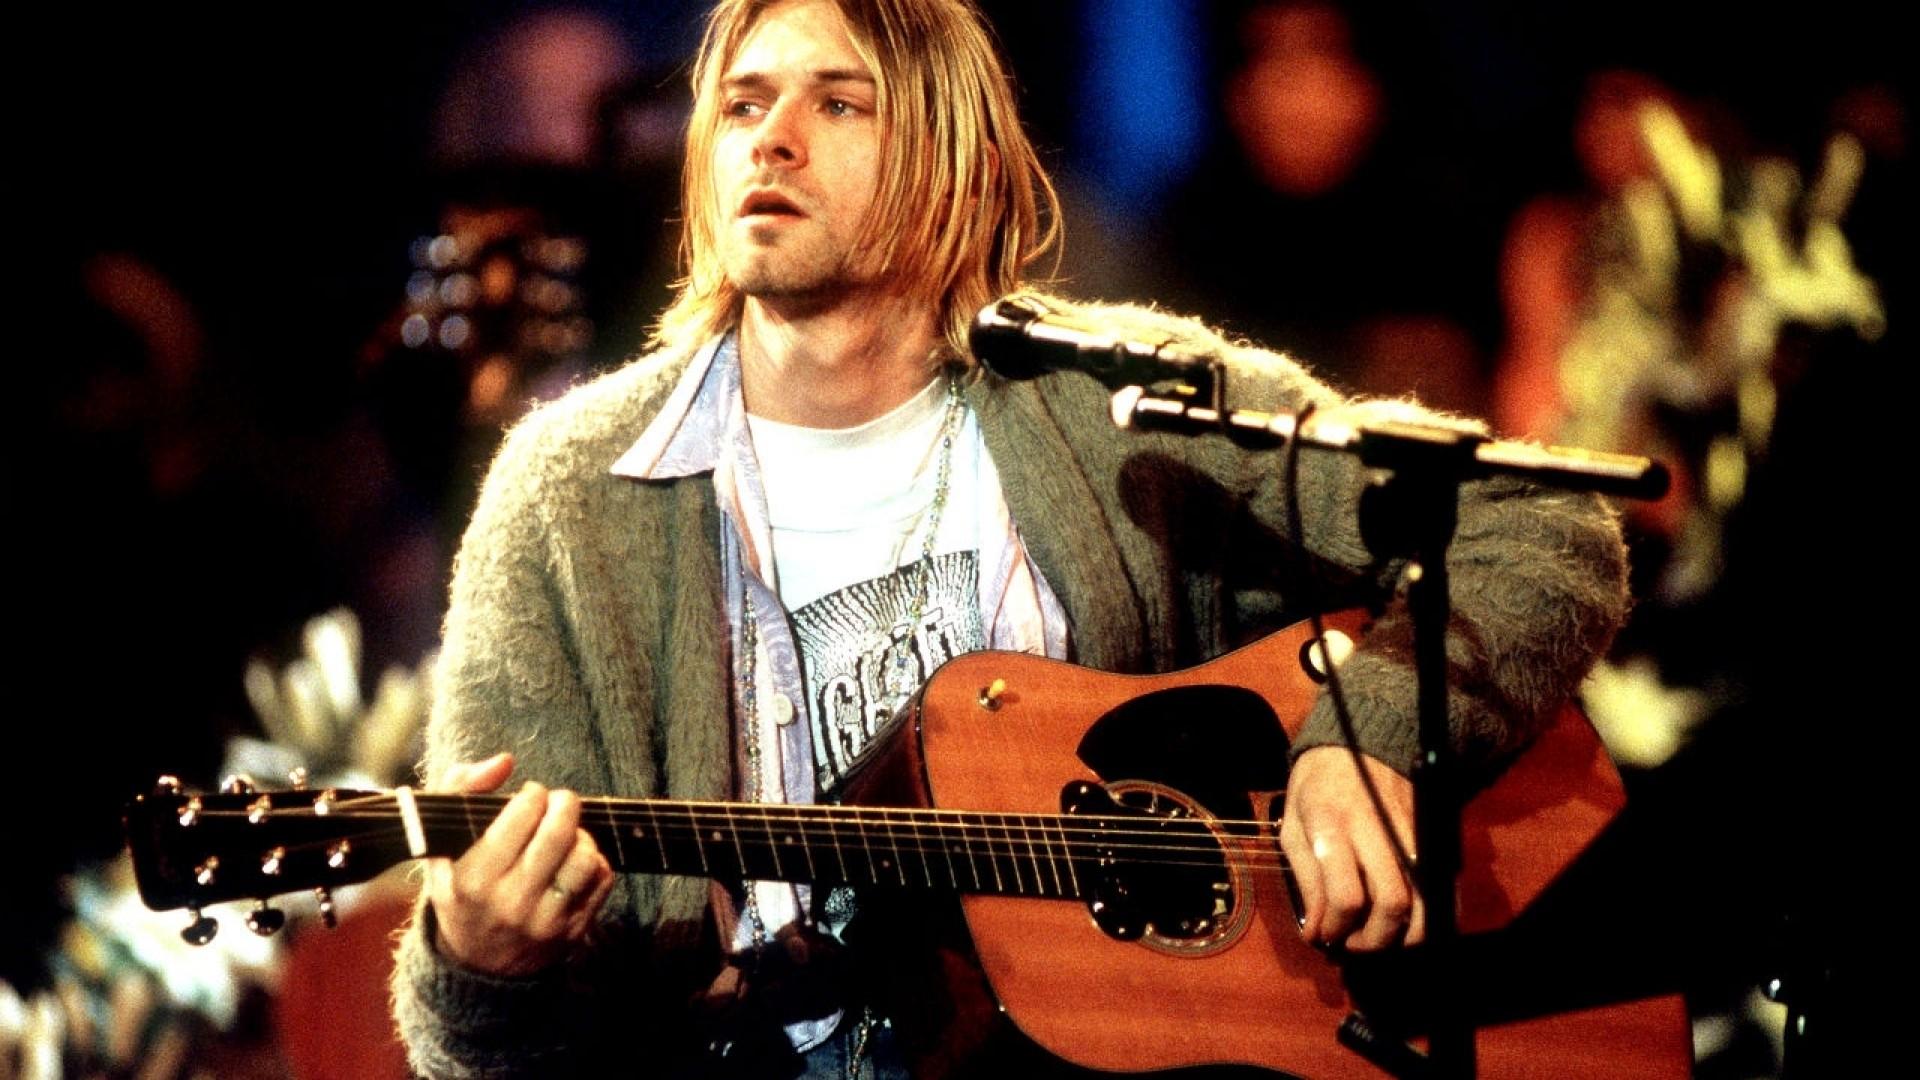 People 1920x1080 Kurt Cobain Nirvana musician guitarist men musical instrument guitar